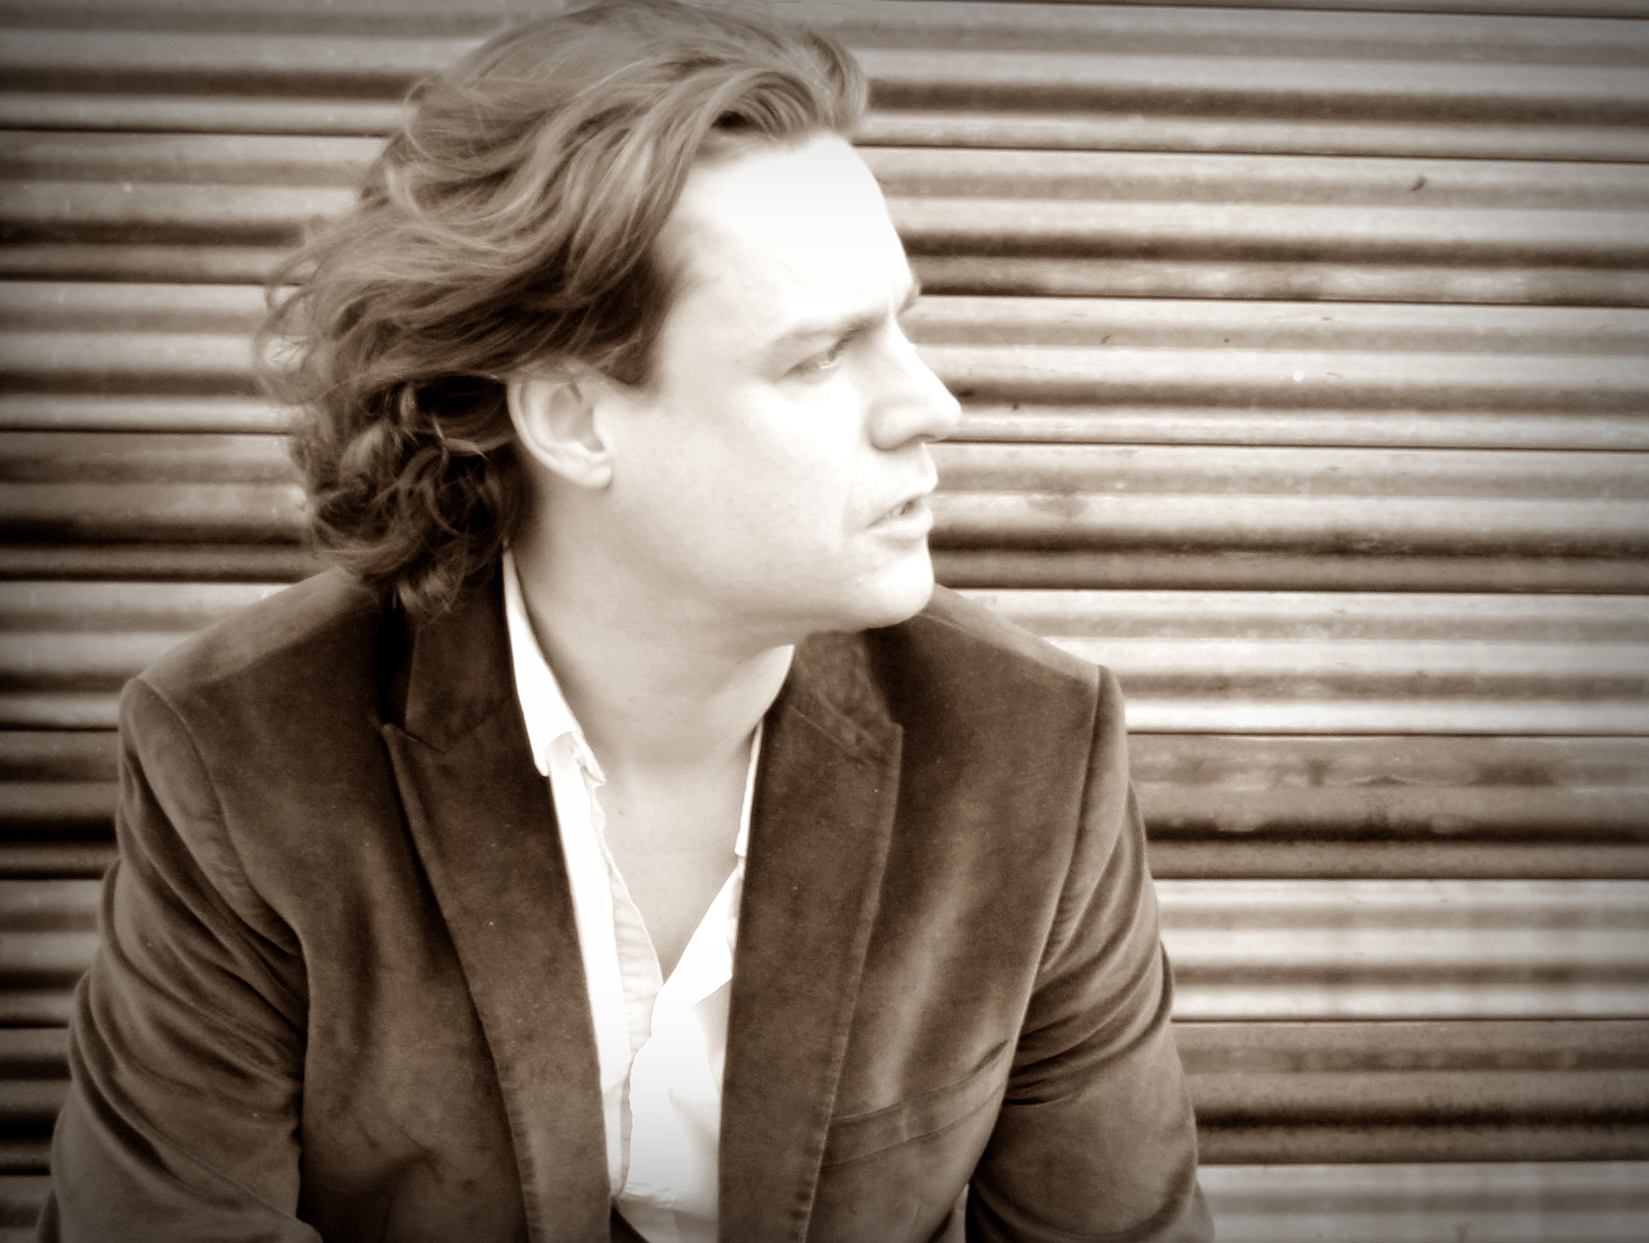 Jann klose releases new album, mosaic on itunes, june 25